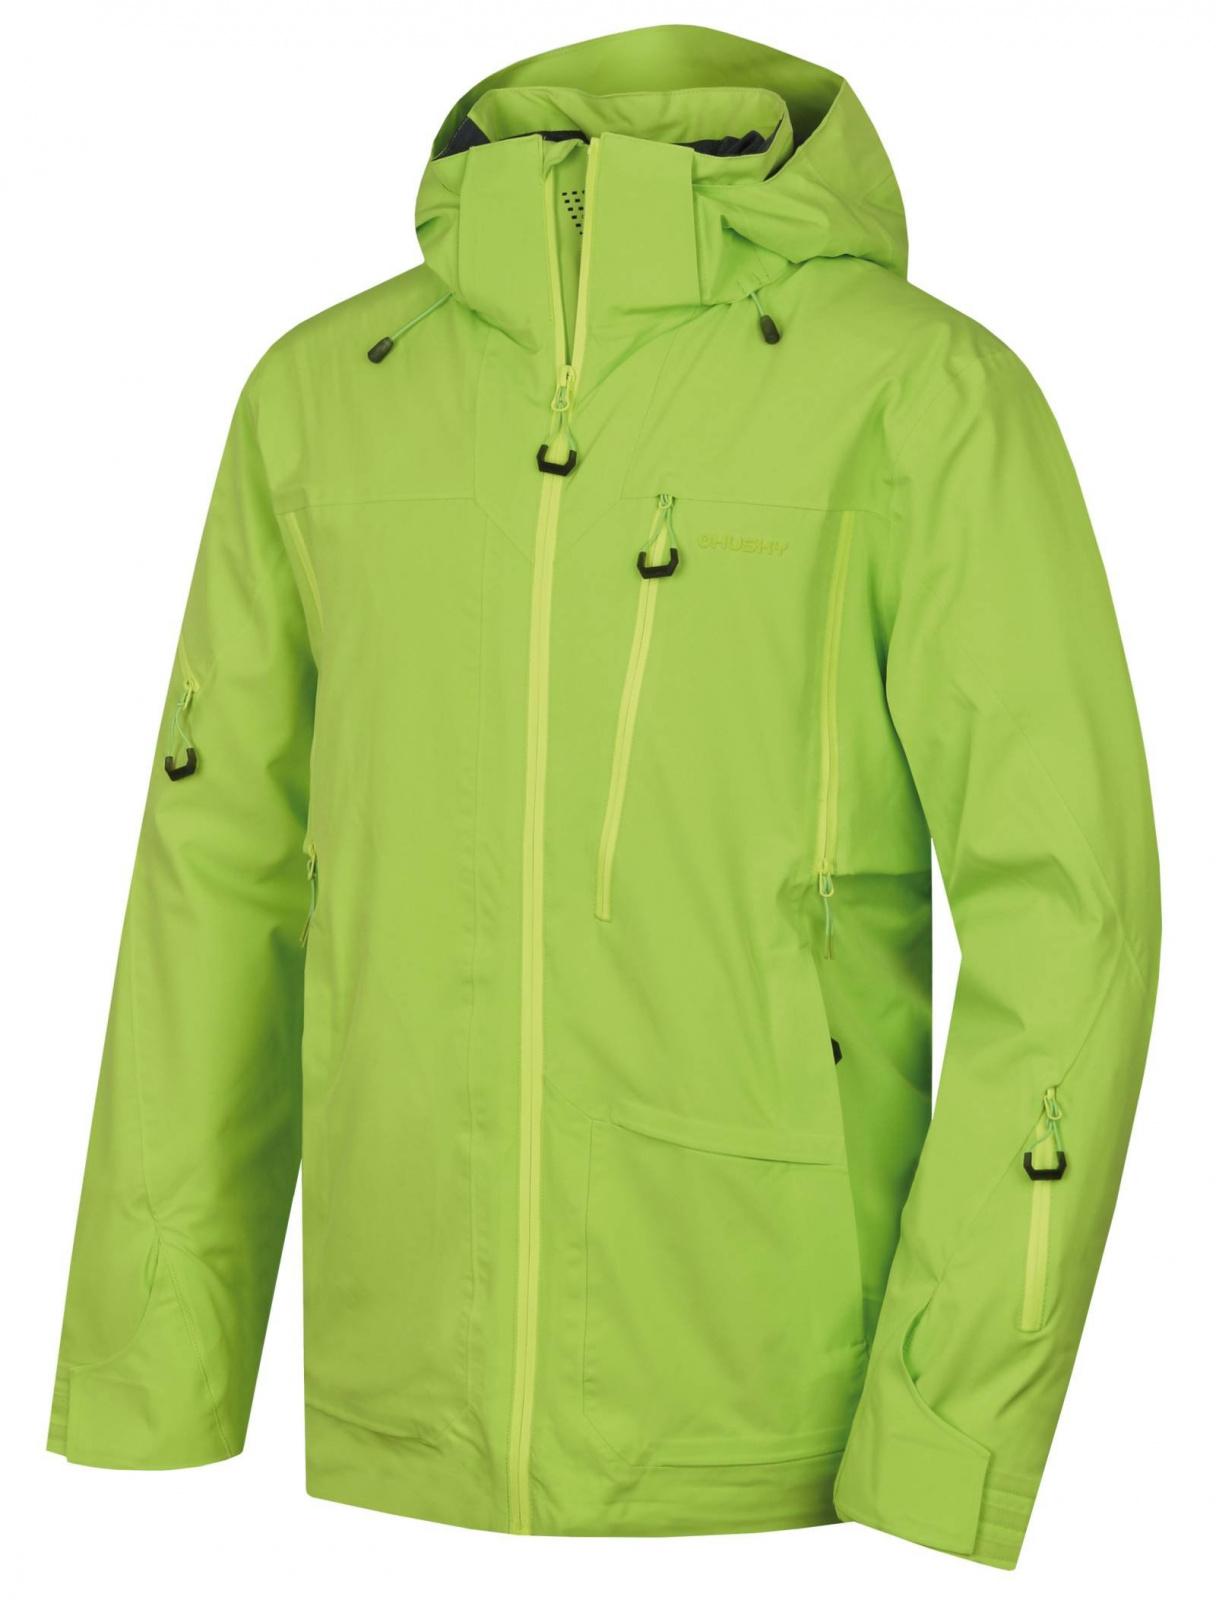 Husky Montry M zelená, XXL Pánska lyžiarska bunda